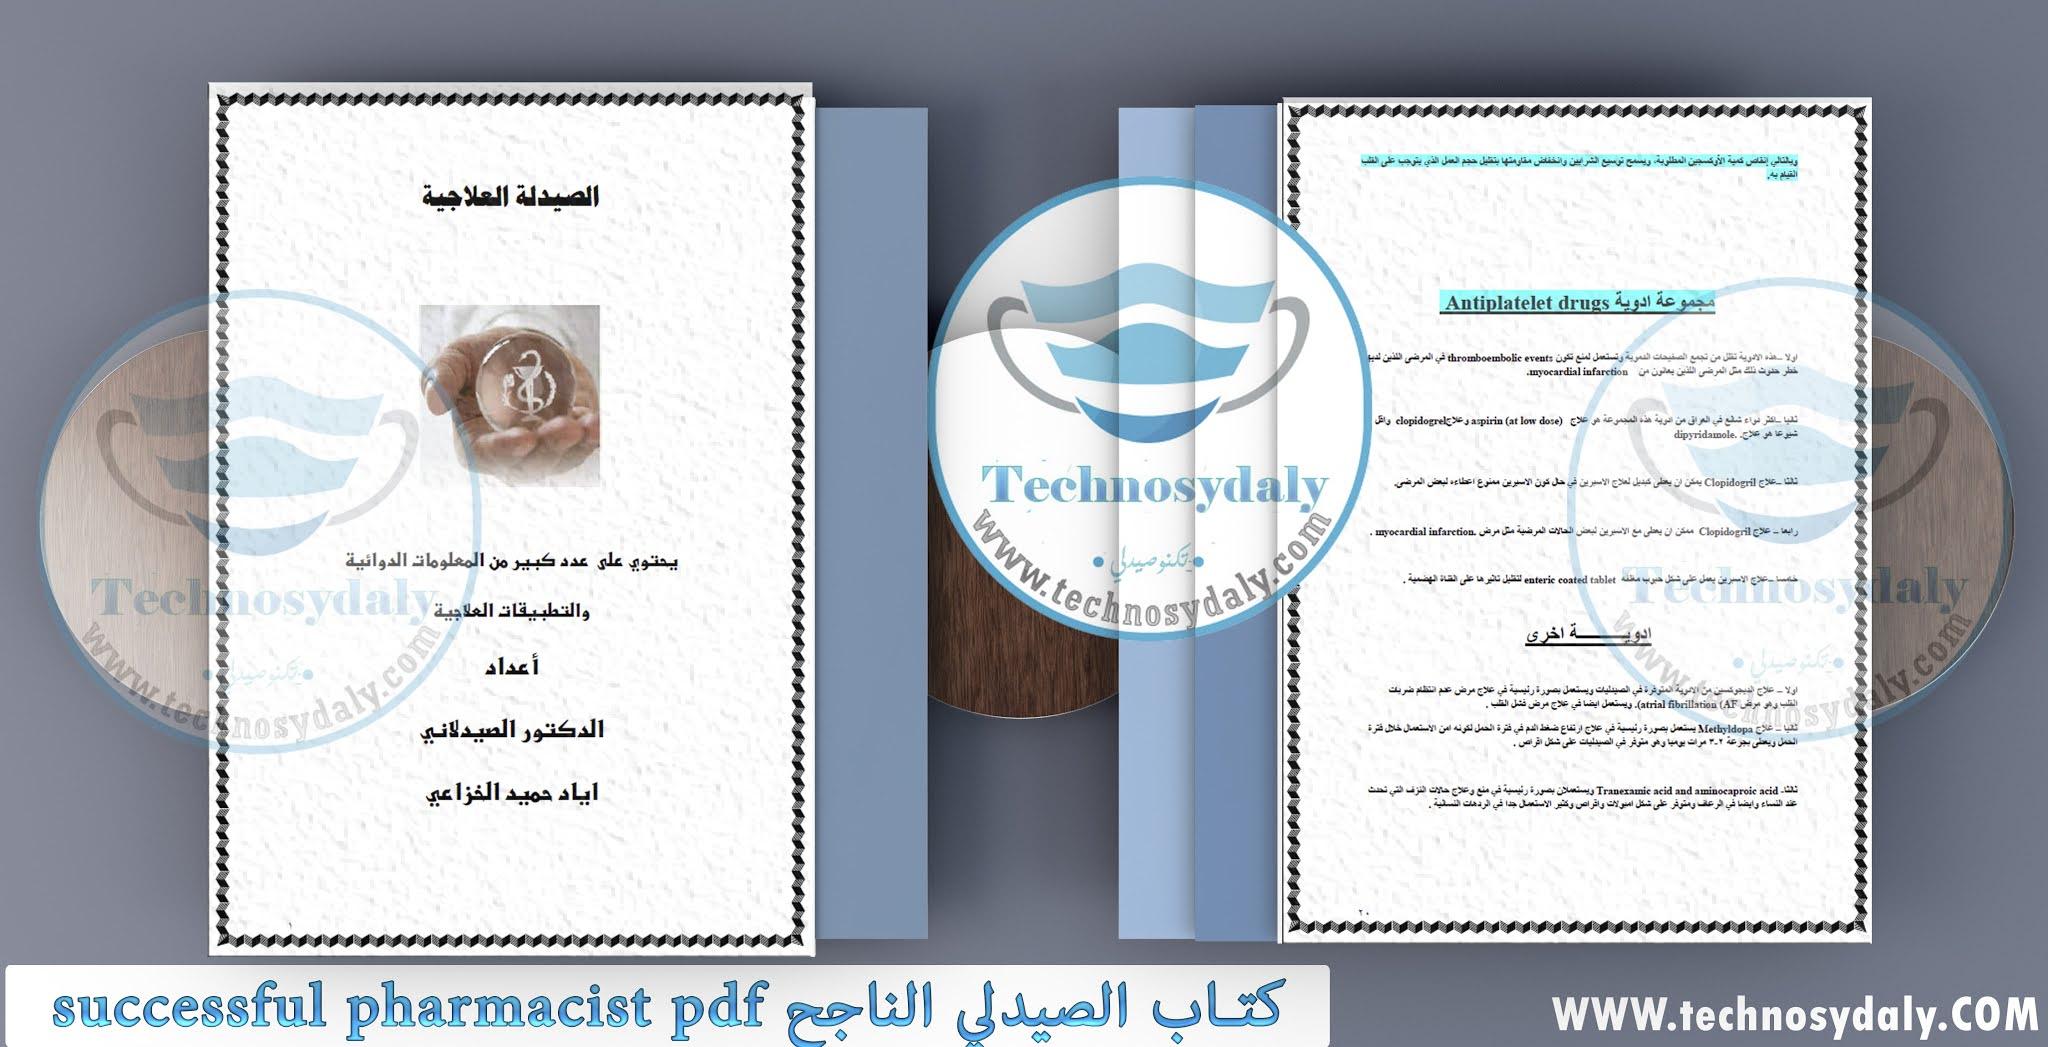 كتاب الصيدلي الناجح successful pharmacist pdf